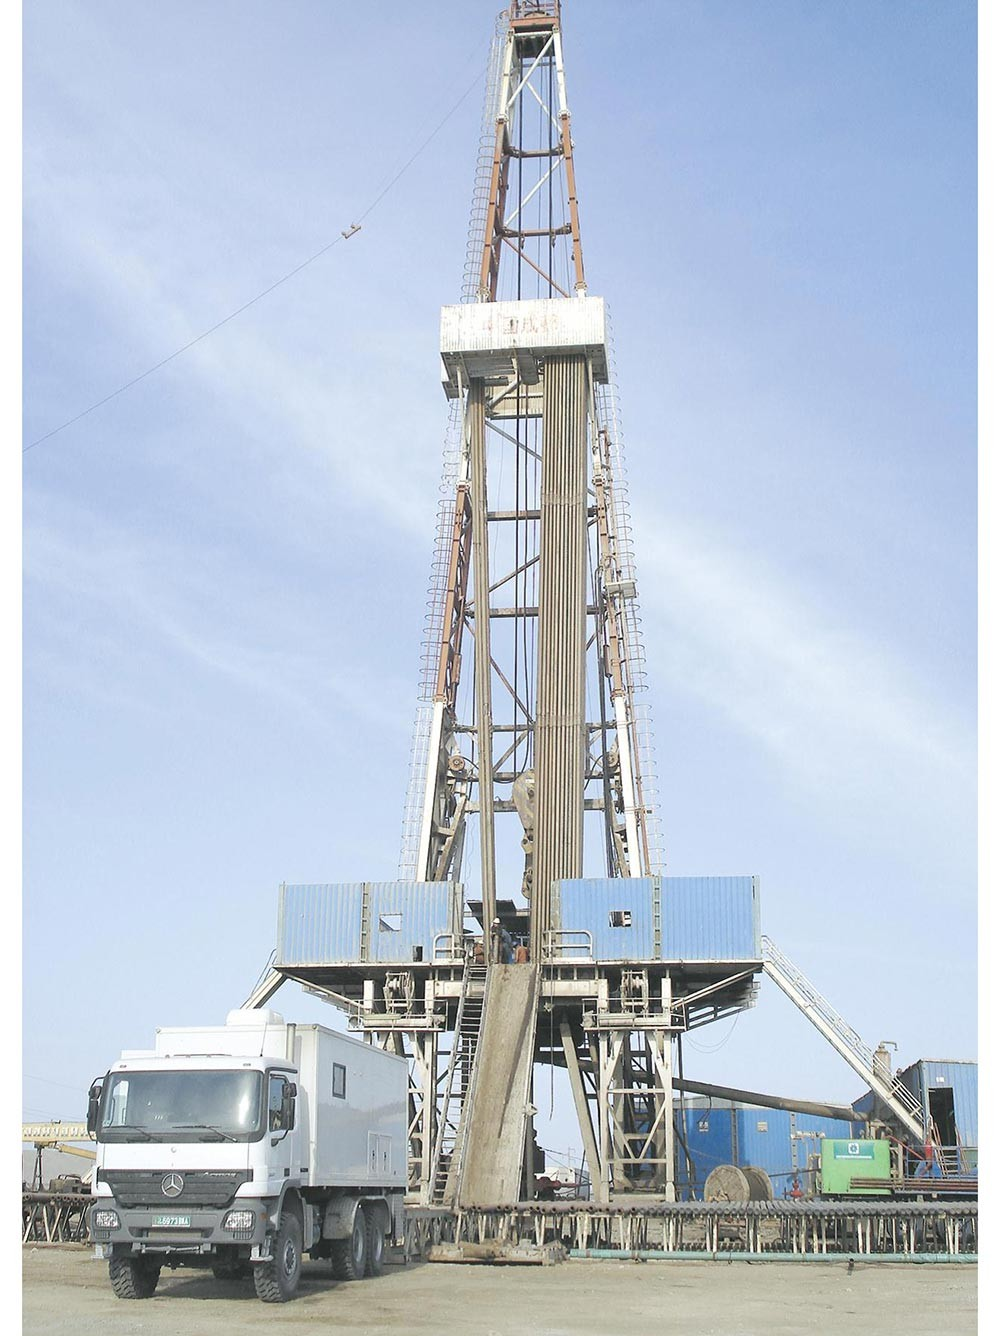 https://www.oilgas.gov.tm/storage/posts/2835/original-161248e16bcf6f.jpeg